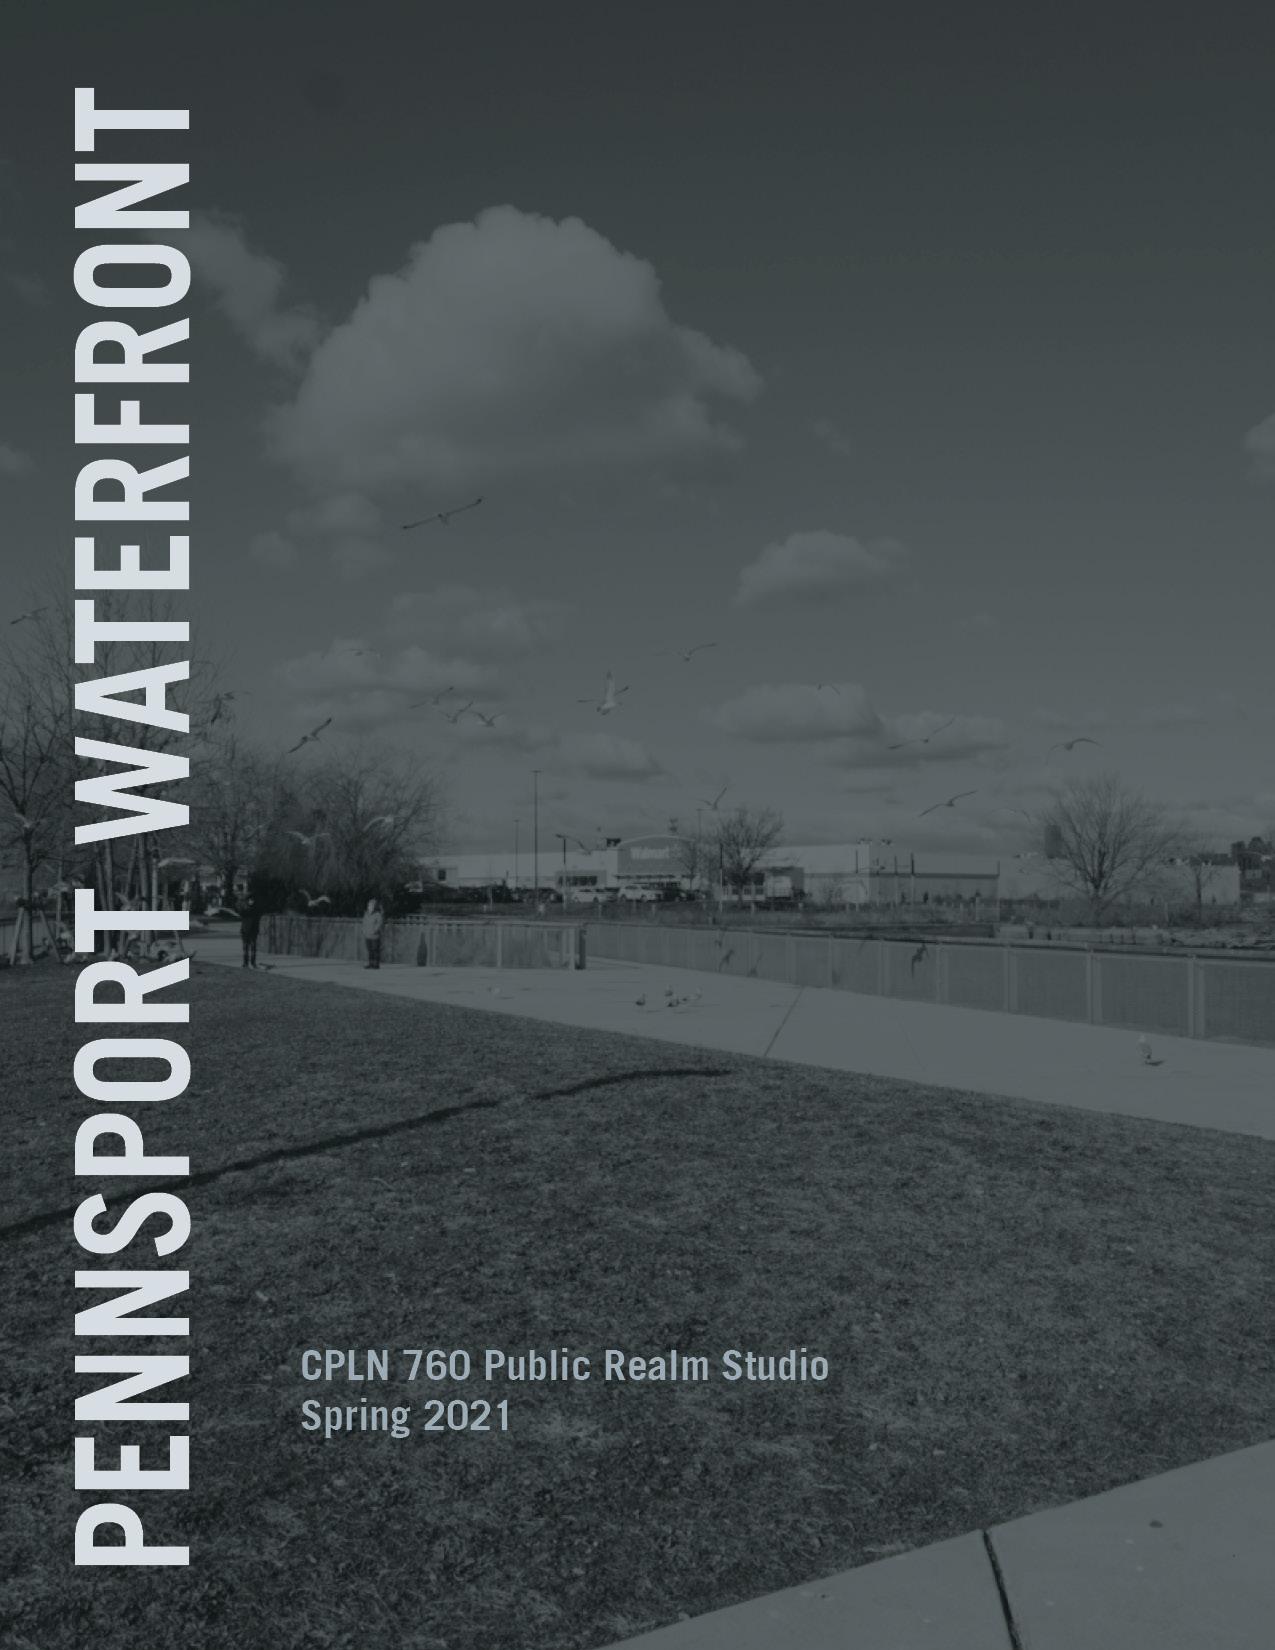 cover of Pennsport studio report